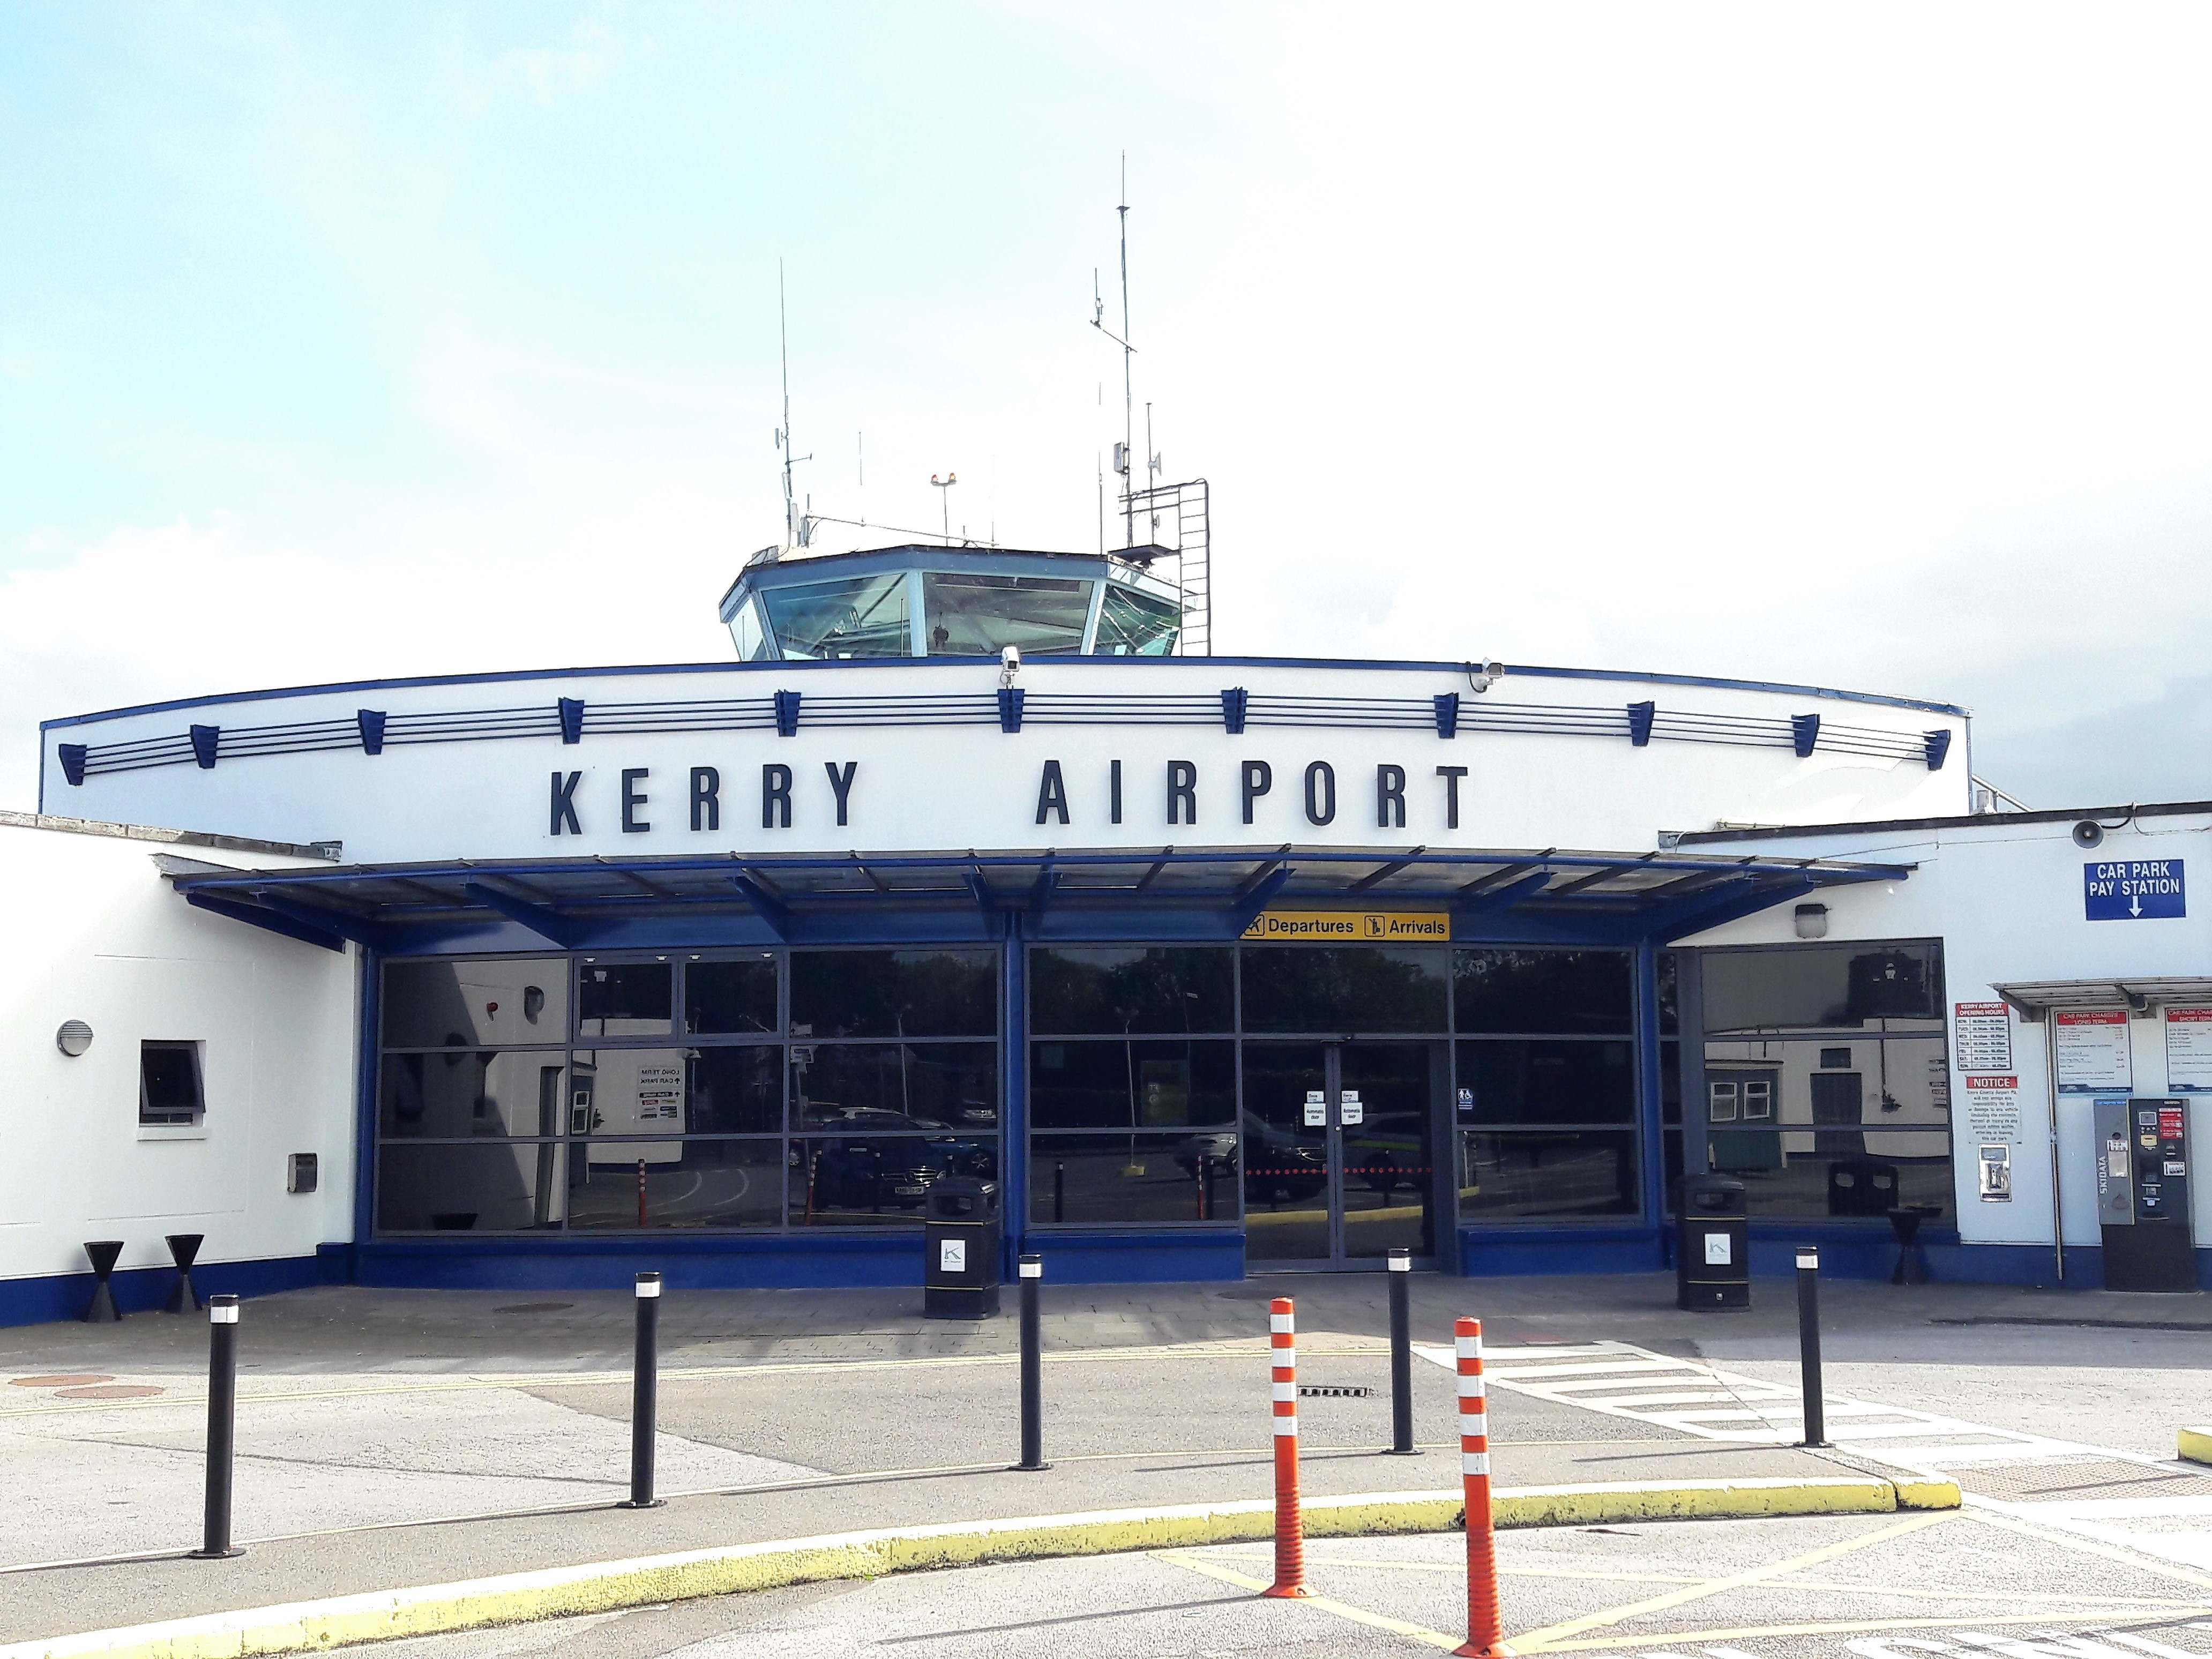 Kerry Airport Main Building